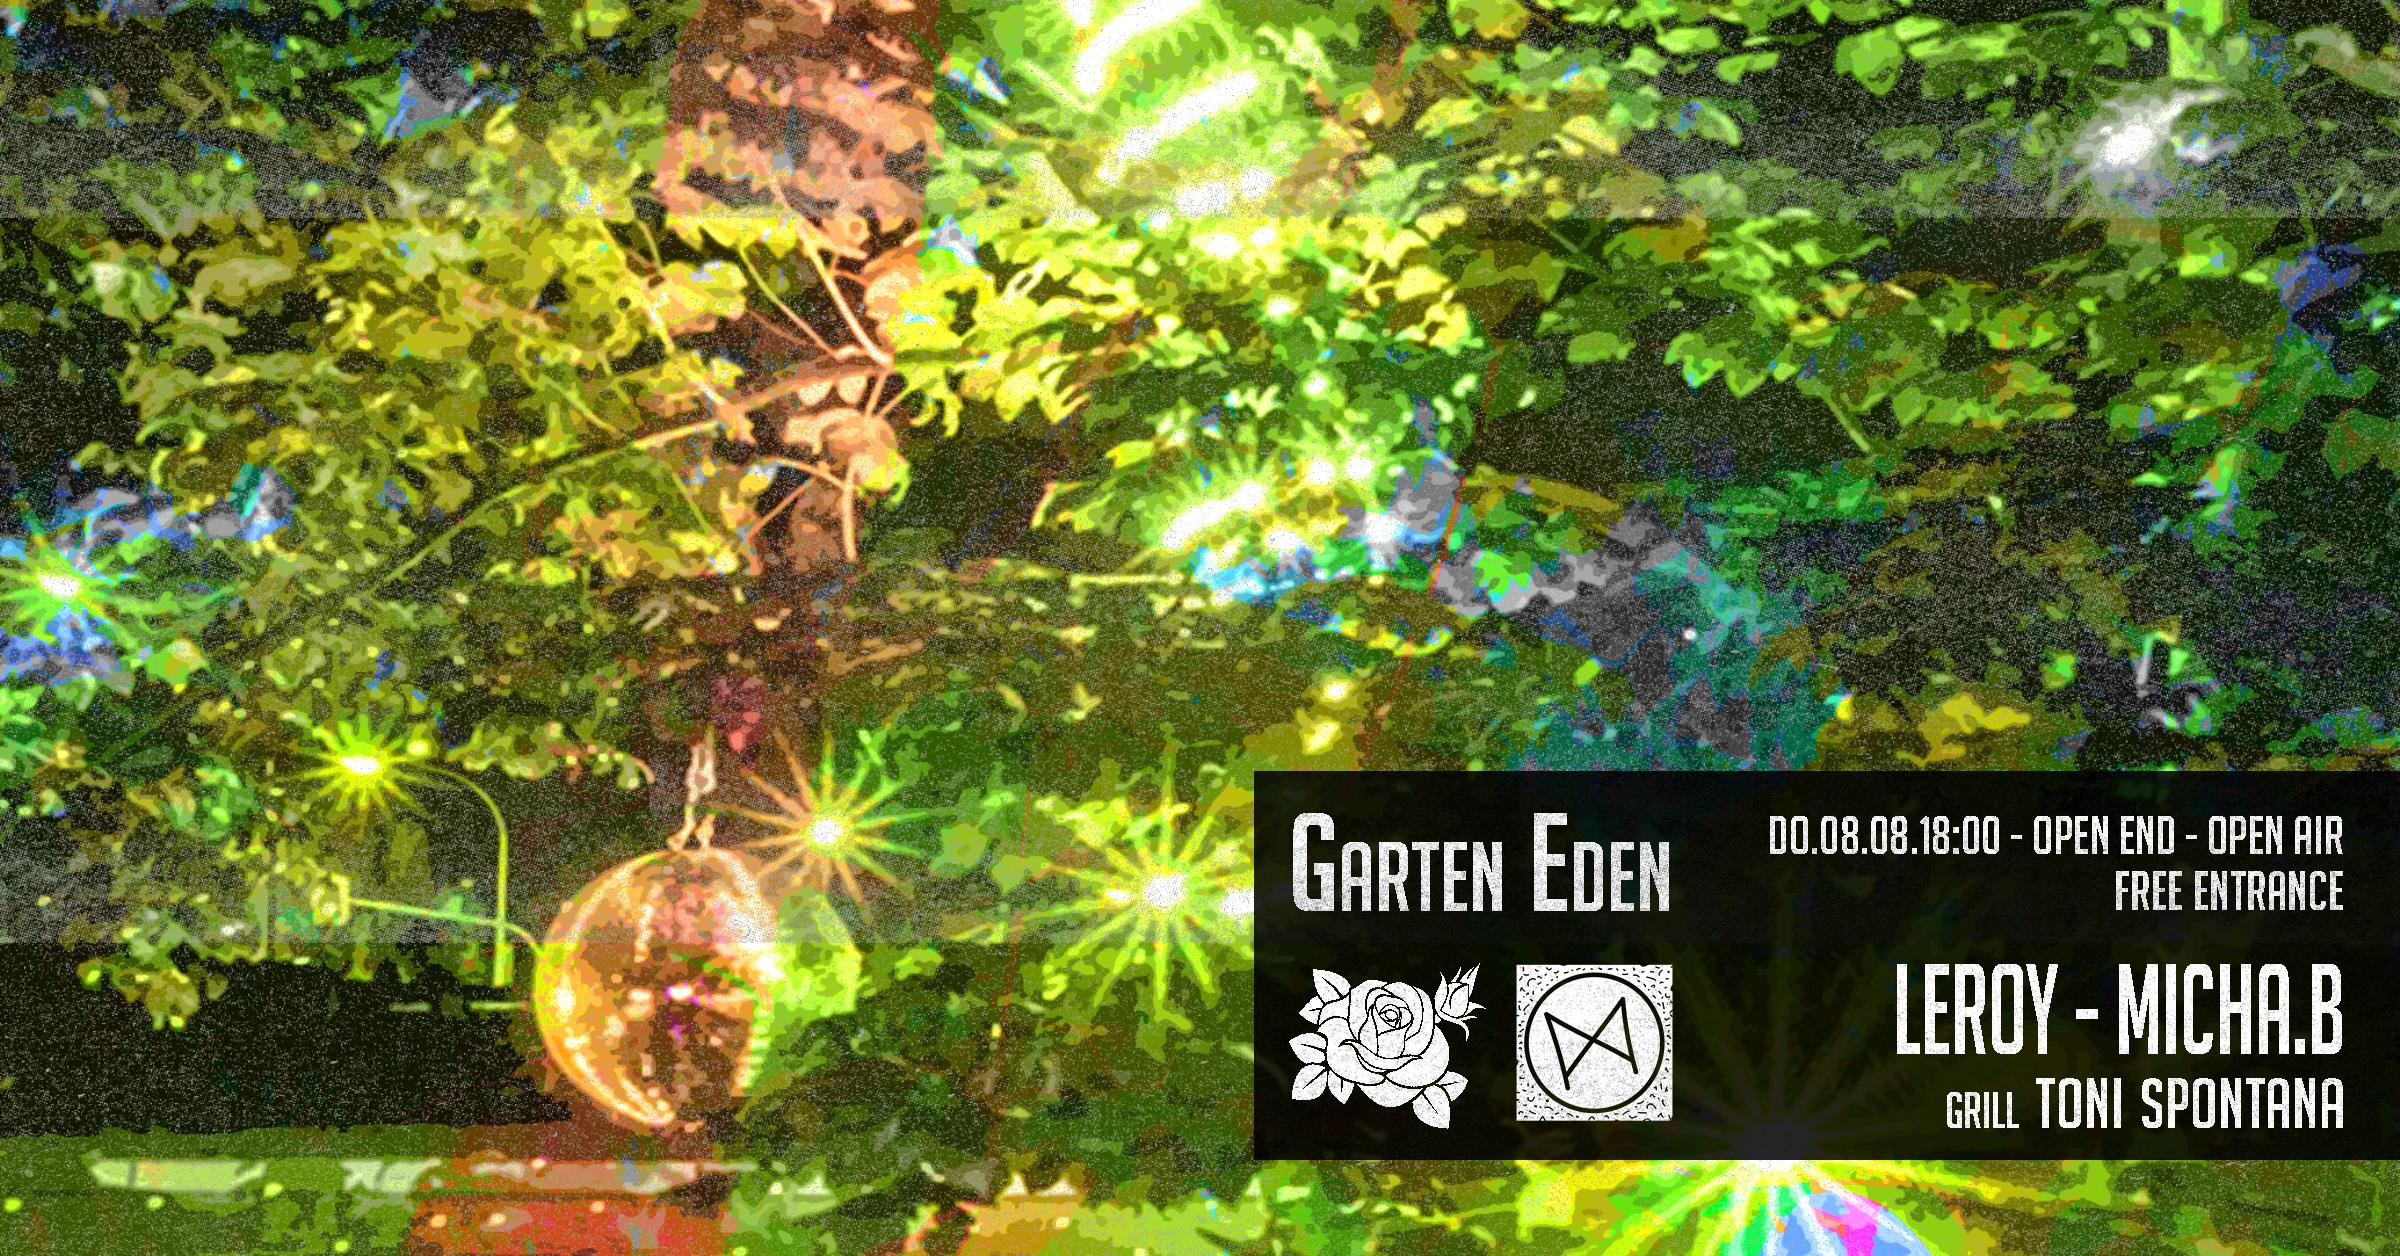 Garten Eden Open Air - Leroy & Micha.B - Eintritt frei!